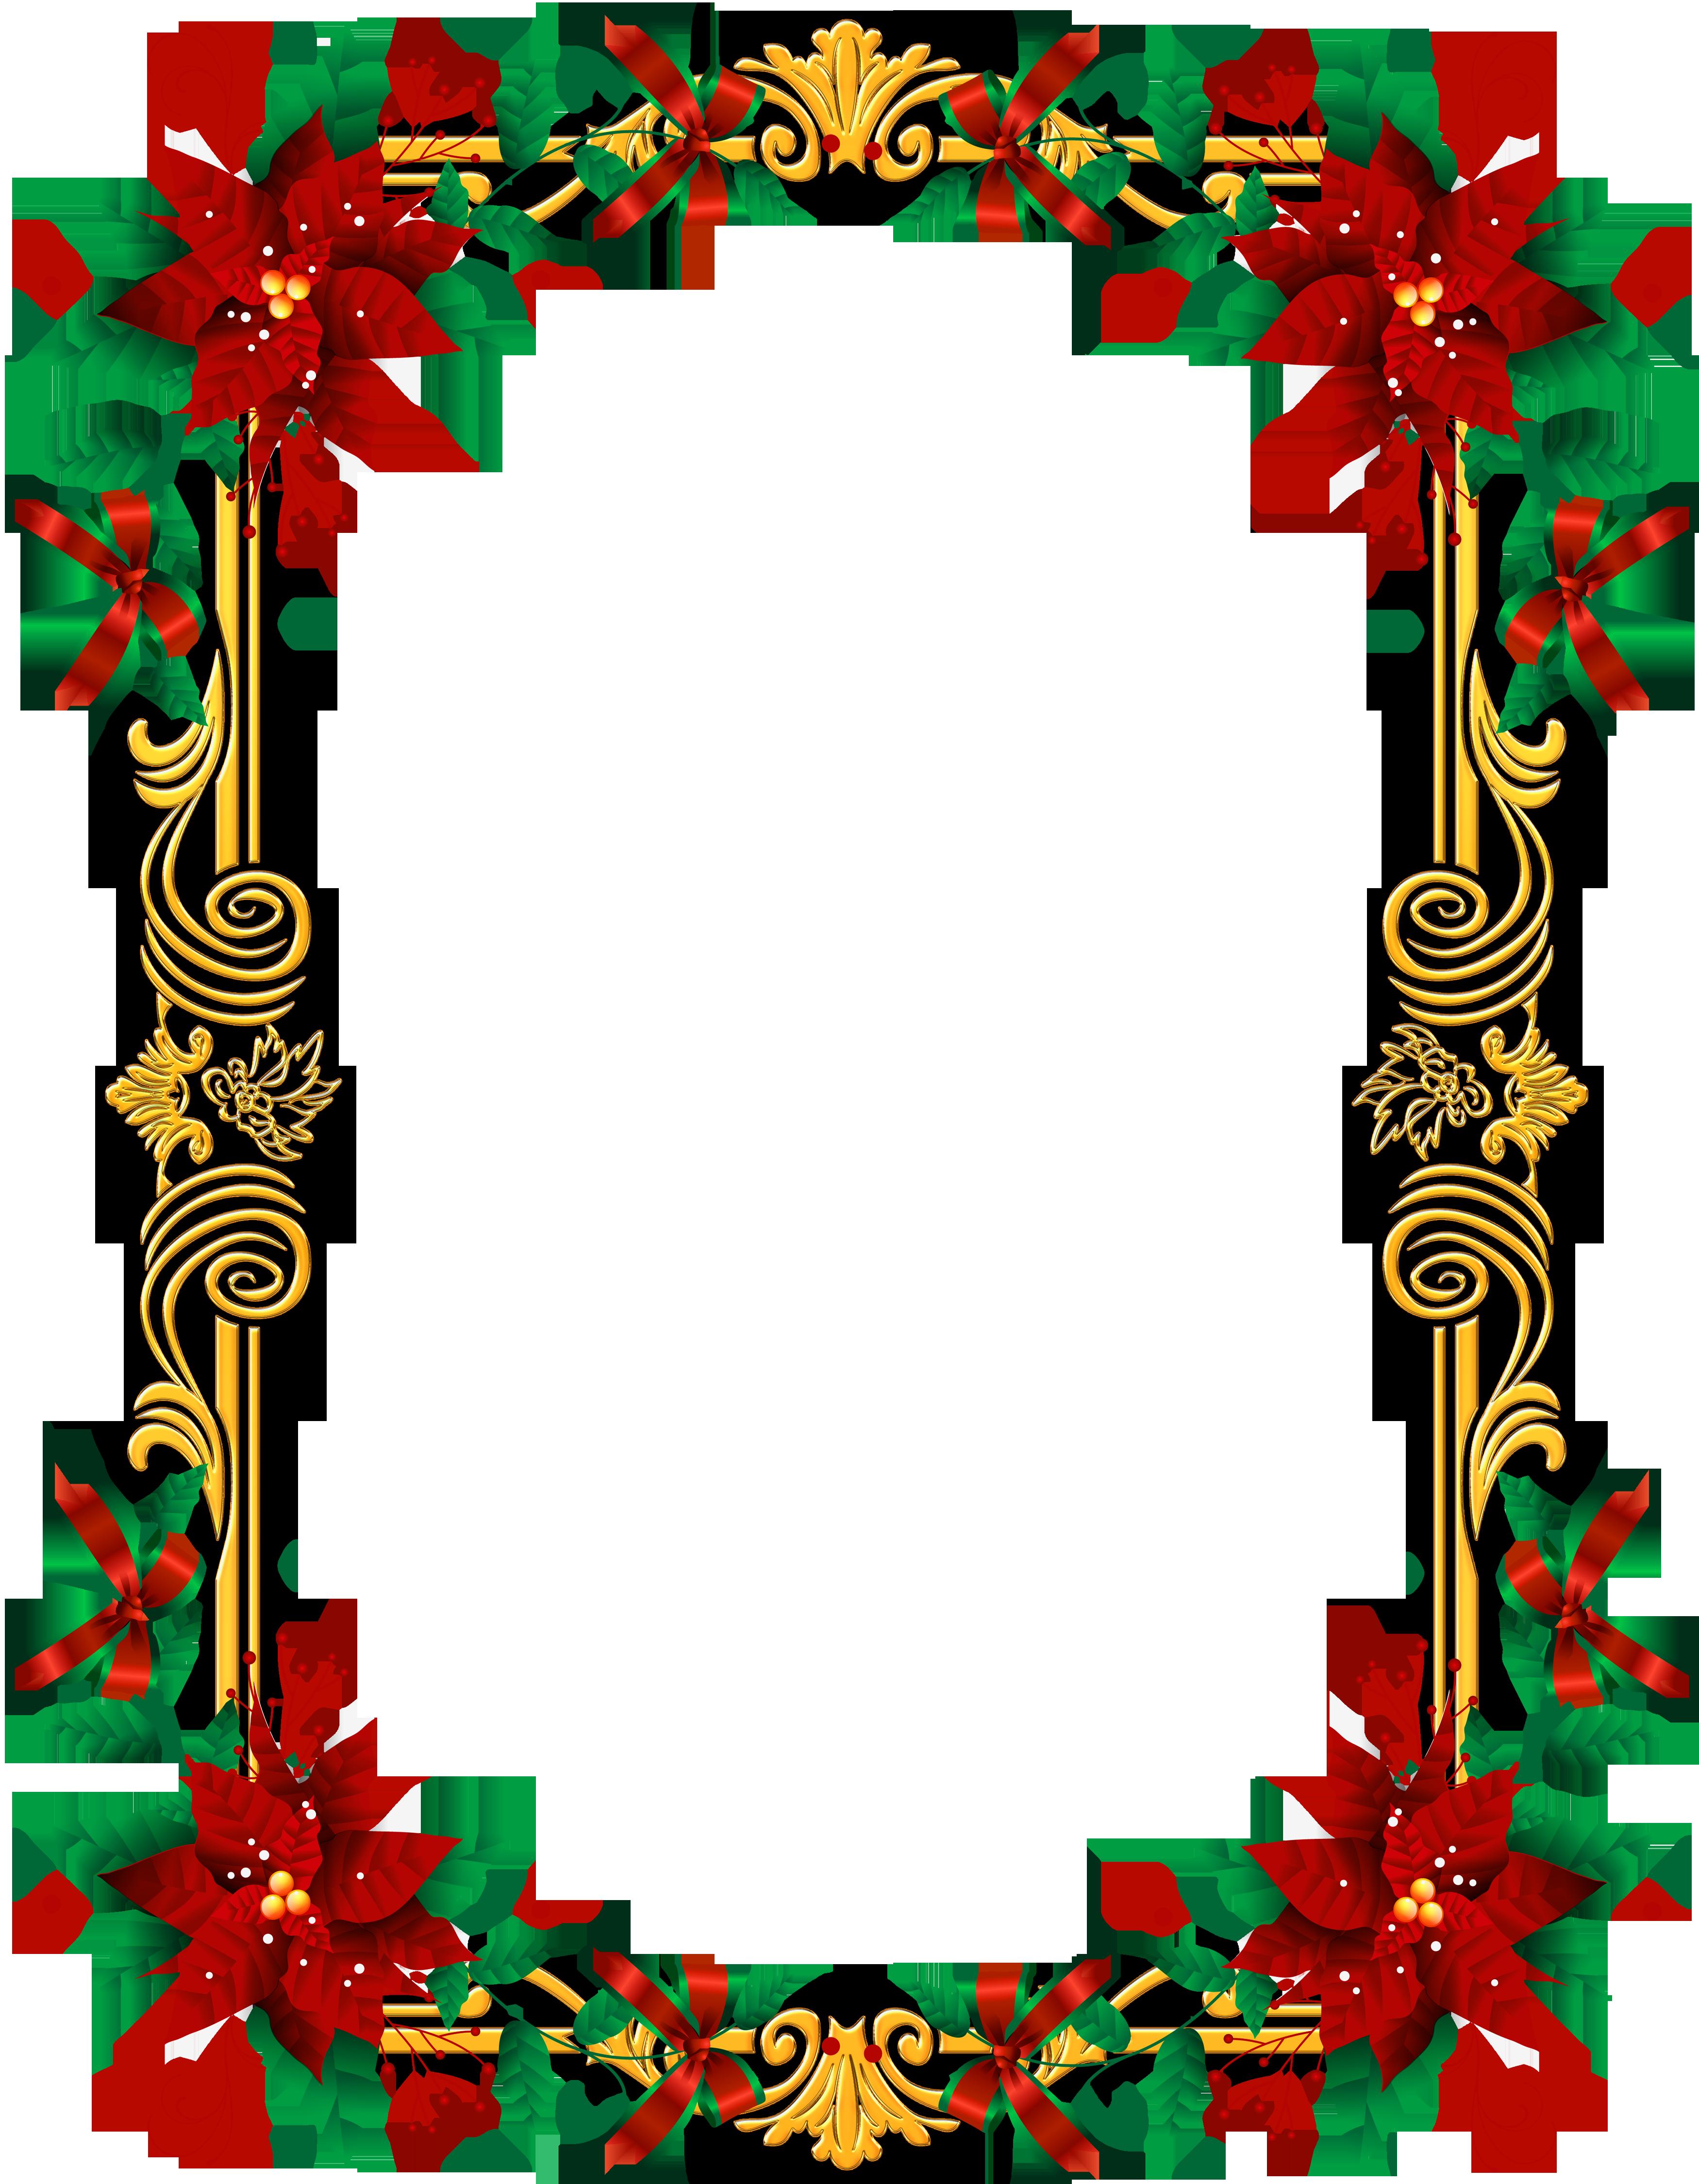 Transparent png christmas frame. Clipart border poinsettia